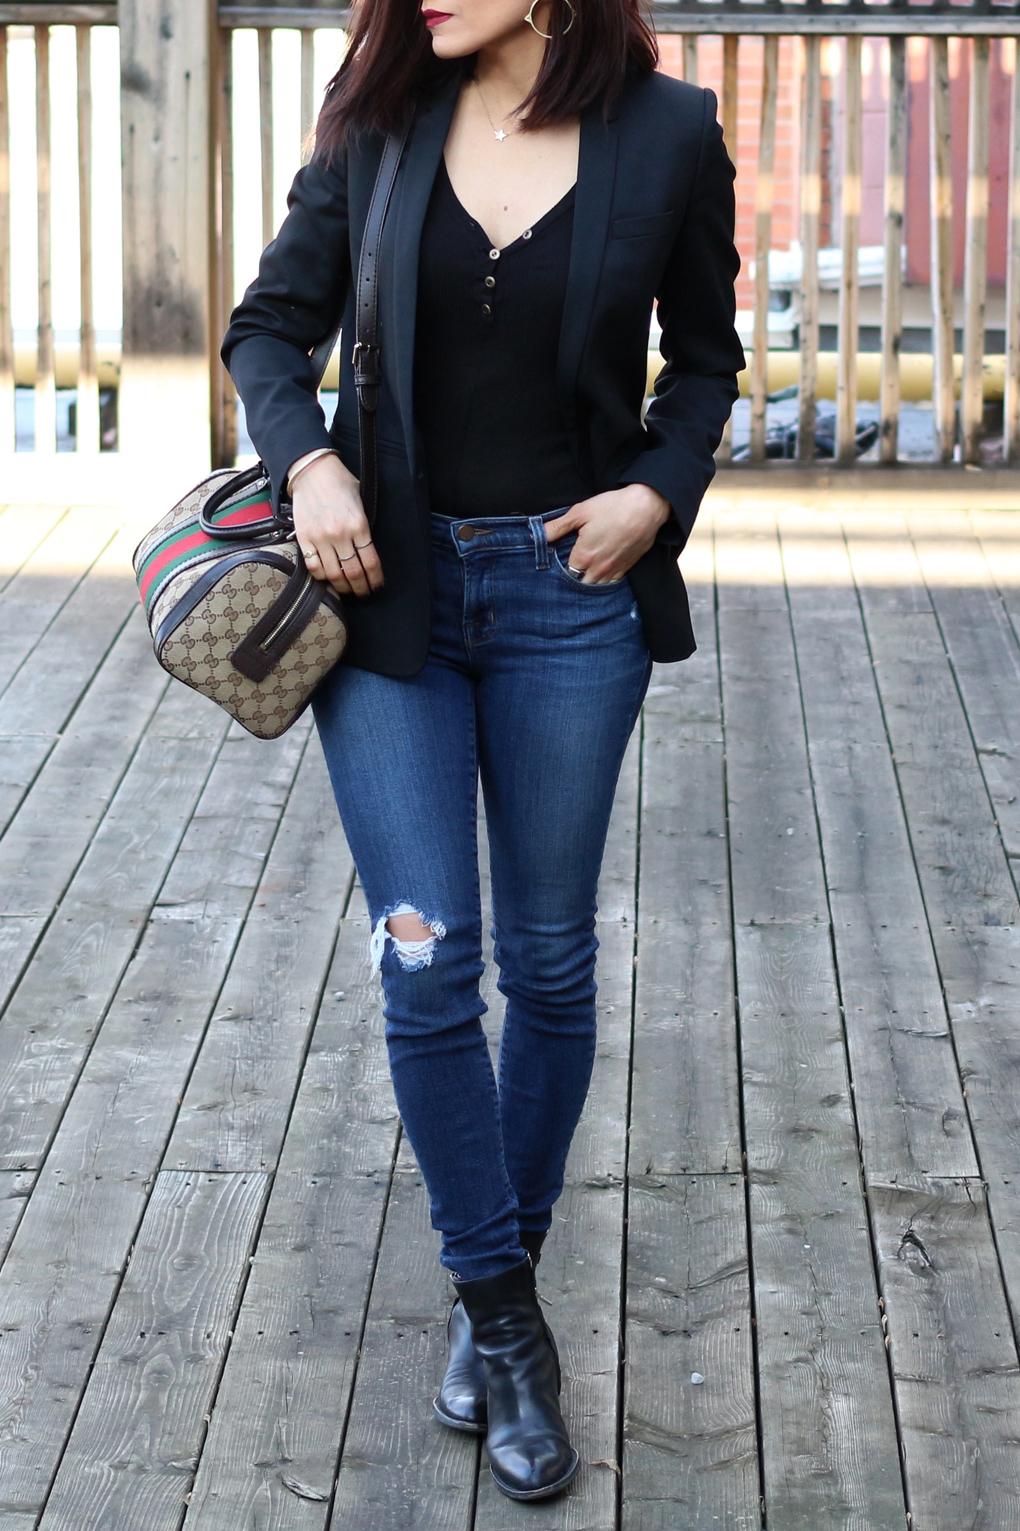 WoahStyle.com-Windsor Store body suit henley-Alexander Wang ankle boots-The Kooples blazer-Jbrand jeans-Gucci Boston bag heritage stripes-ootd-street style-toronto fashion beauty blogger_1.jpg